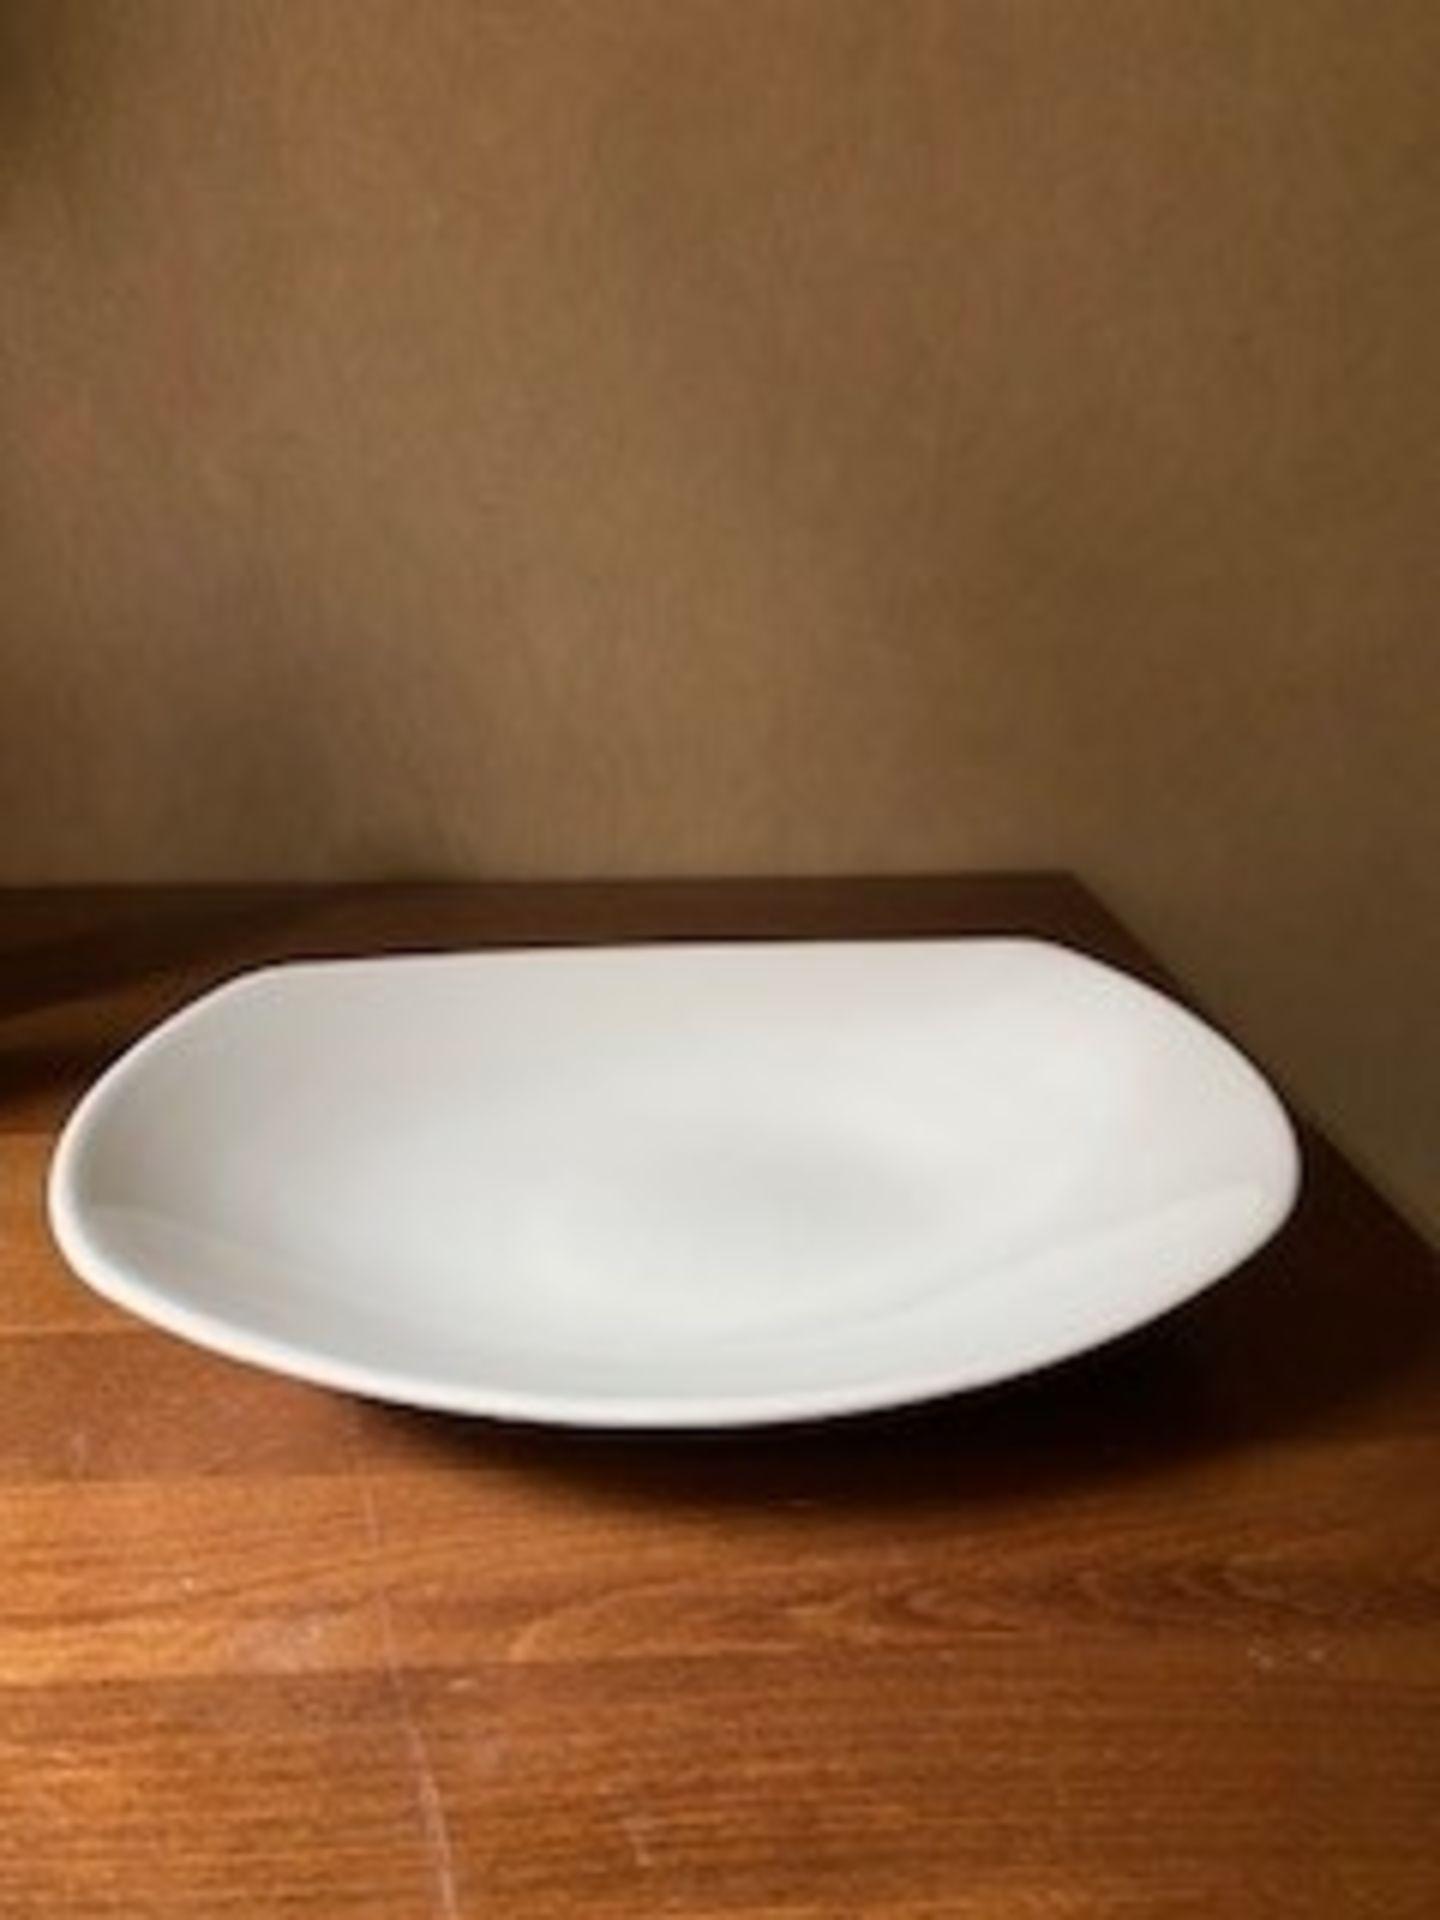 Steelite Pasta Bowl white 30cm set of 19 - Image 3 of 3